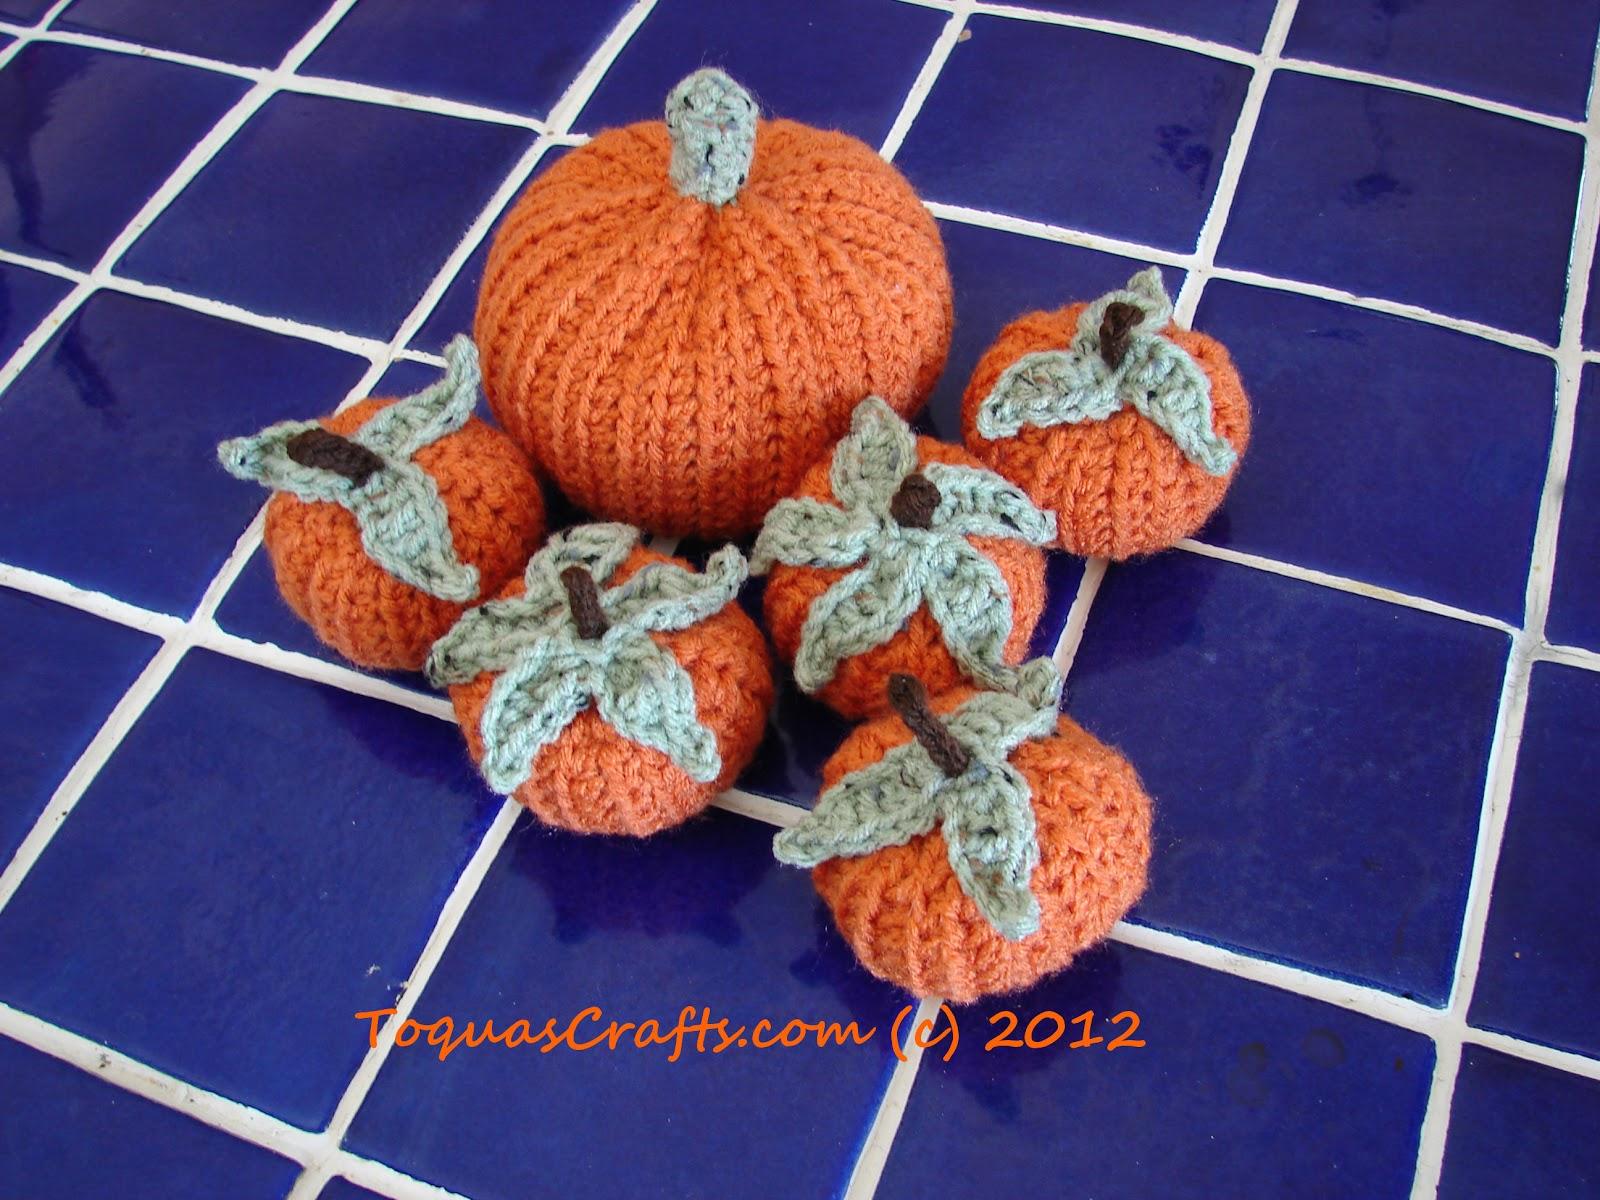 Toquas Crafts Crocheted Fall Pumpkins